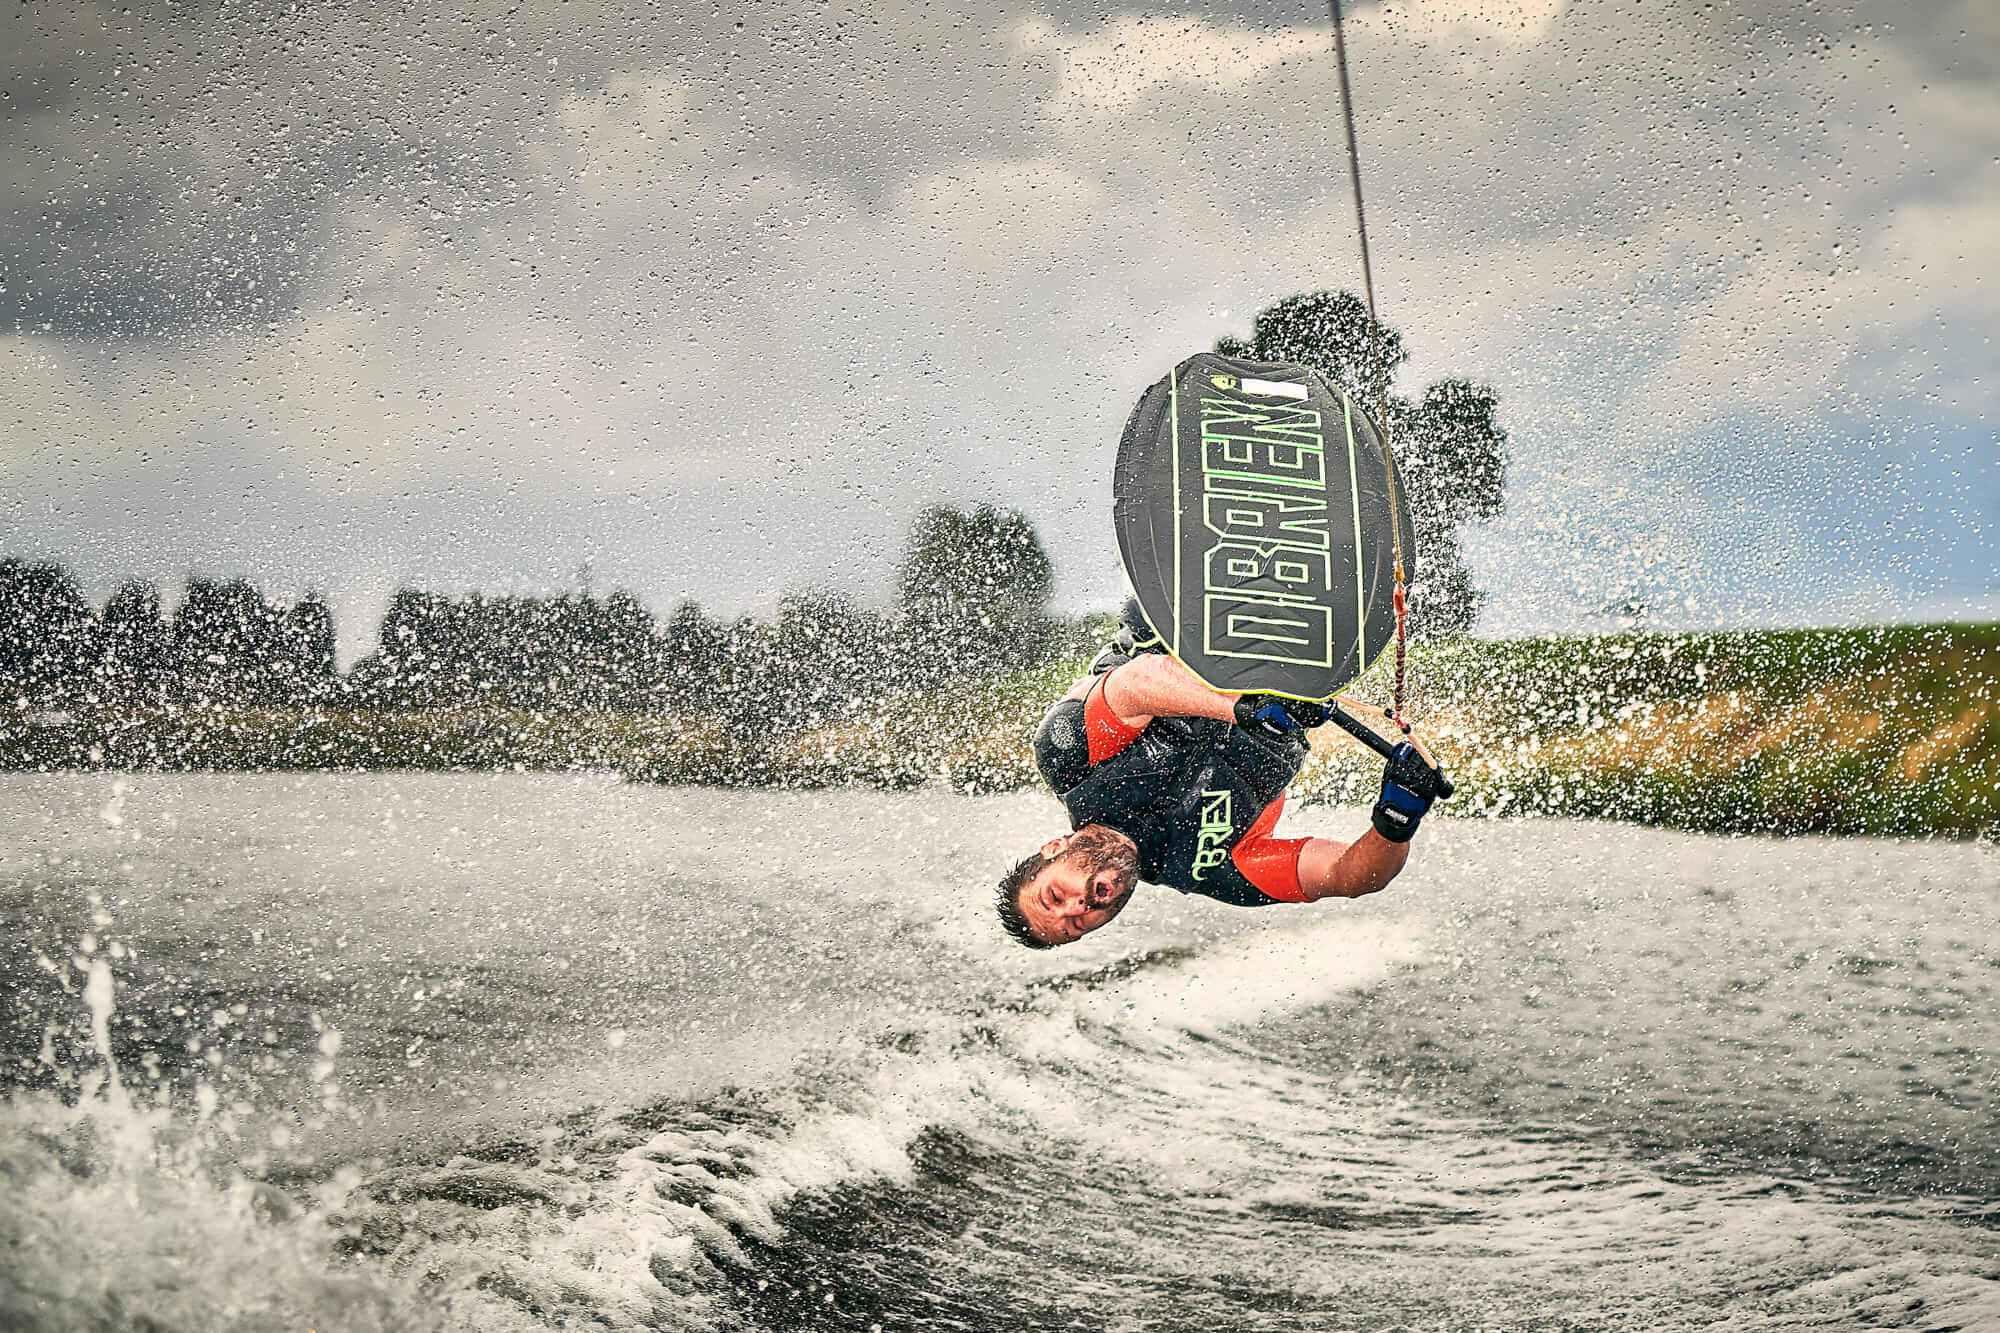 Ian Wilkinson - Inverted Air